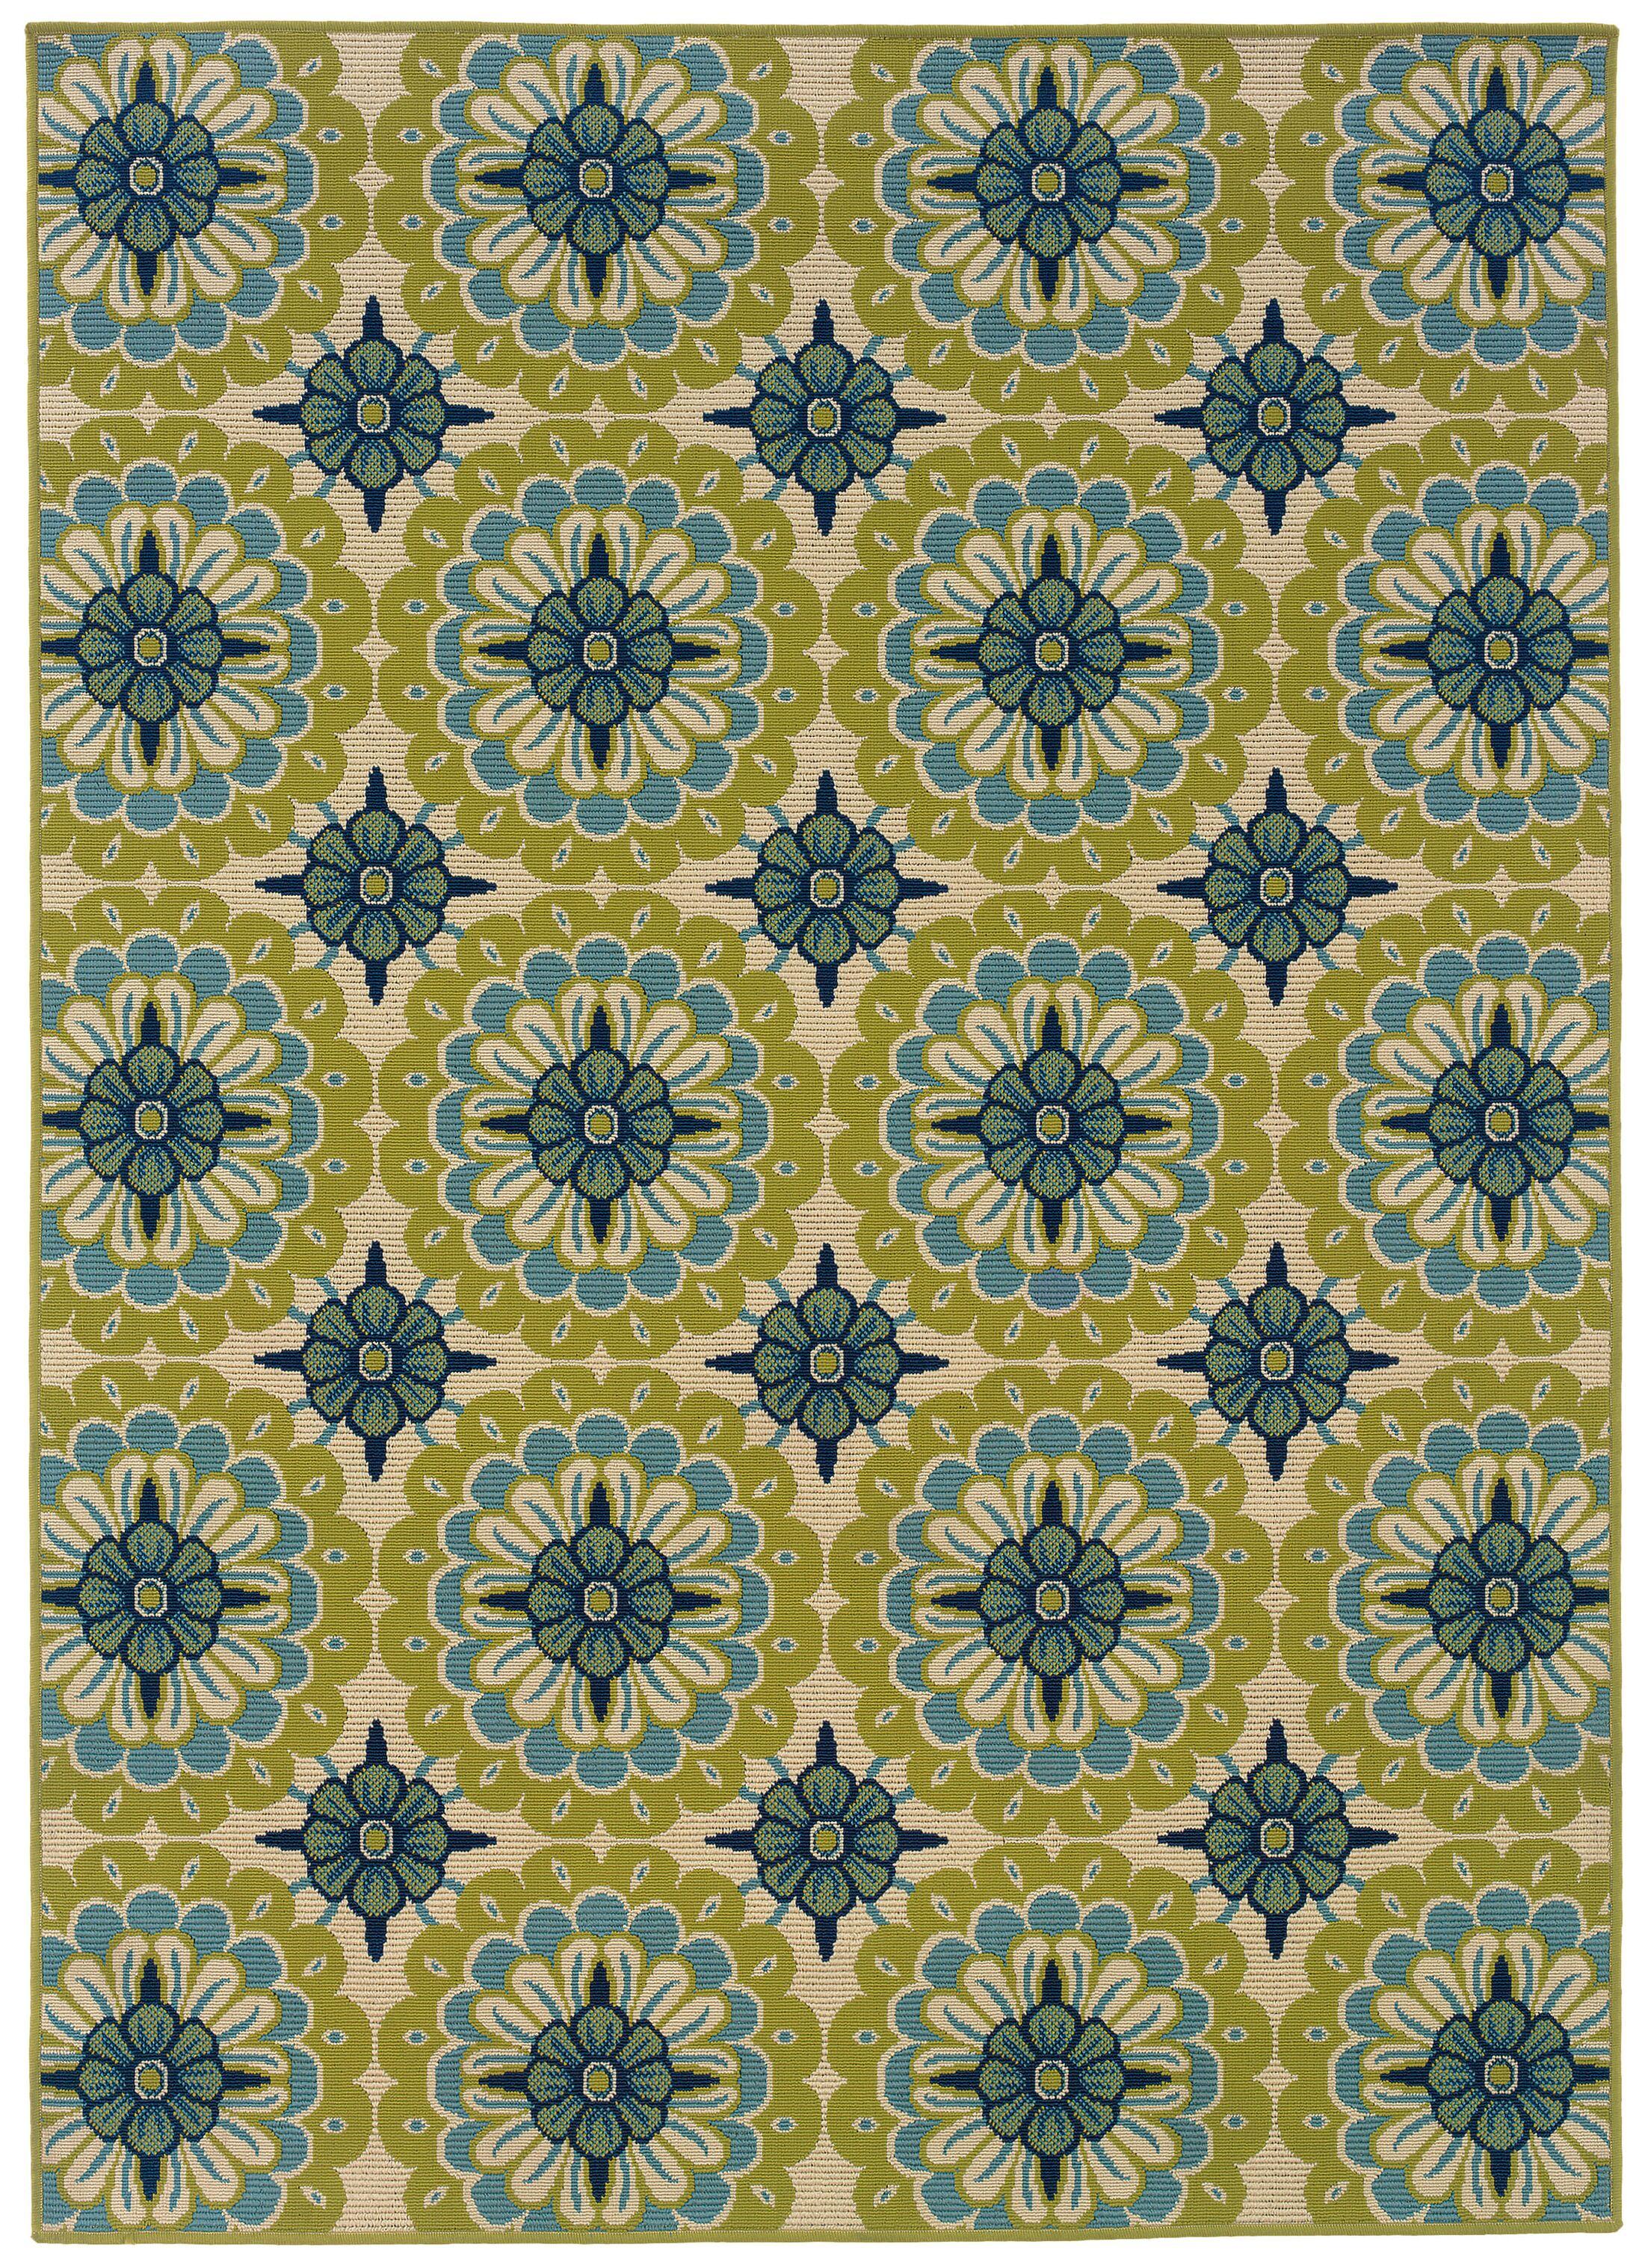 Brendel Green/Ivory Indoor/Outdoor Area Rug Rug Size: Rectangle 5'3